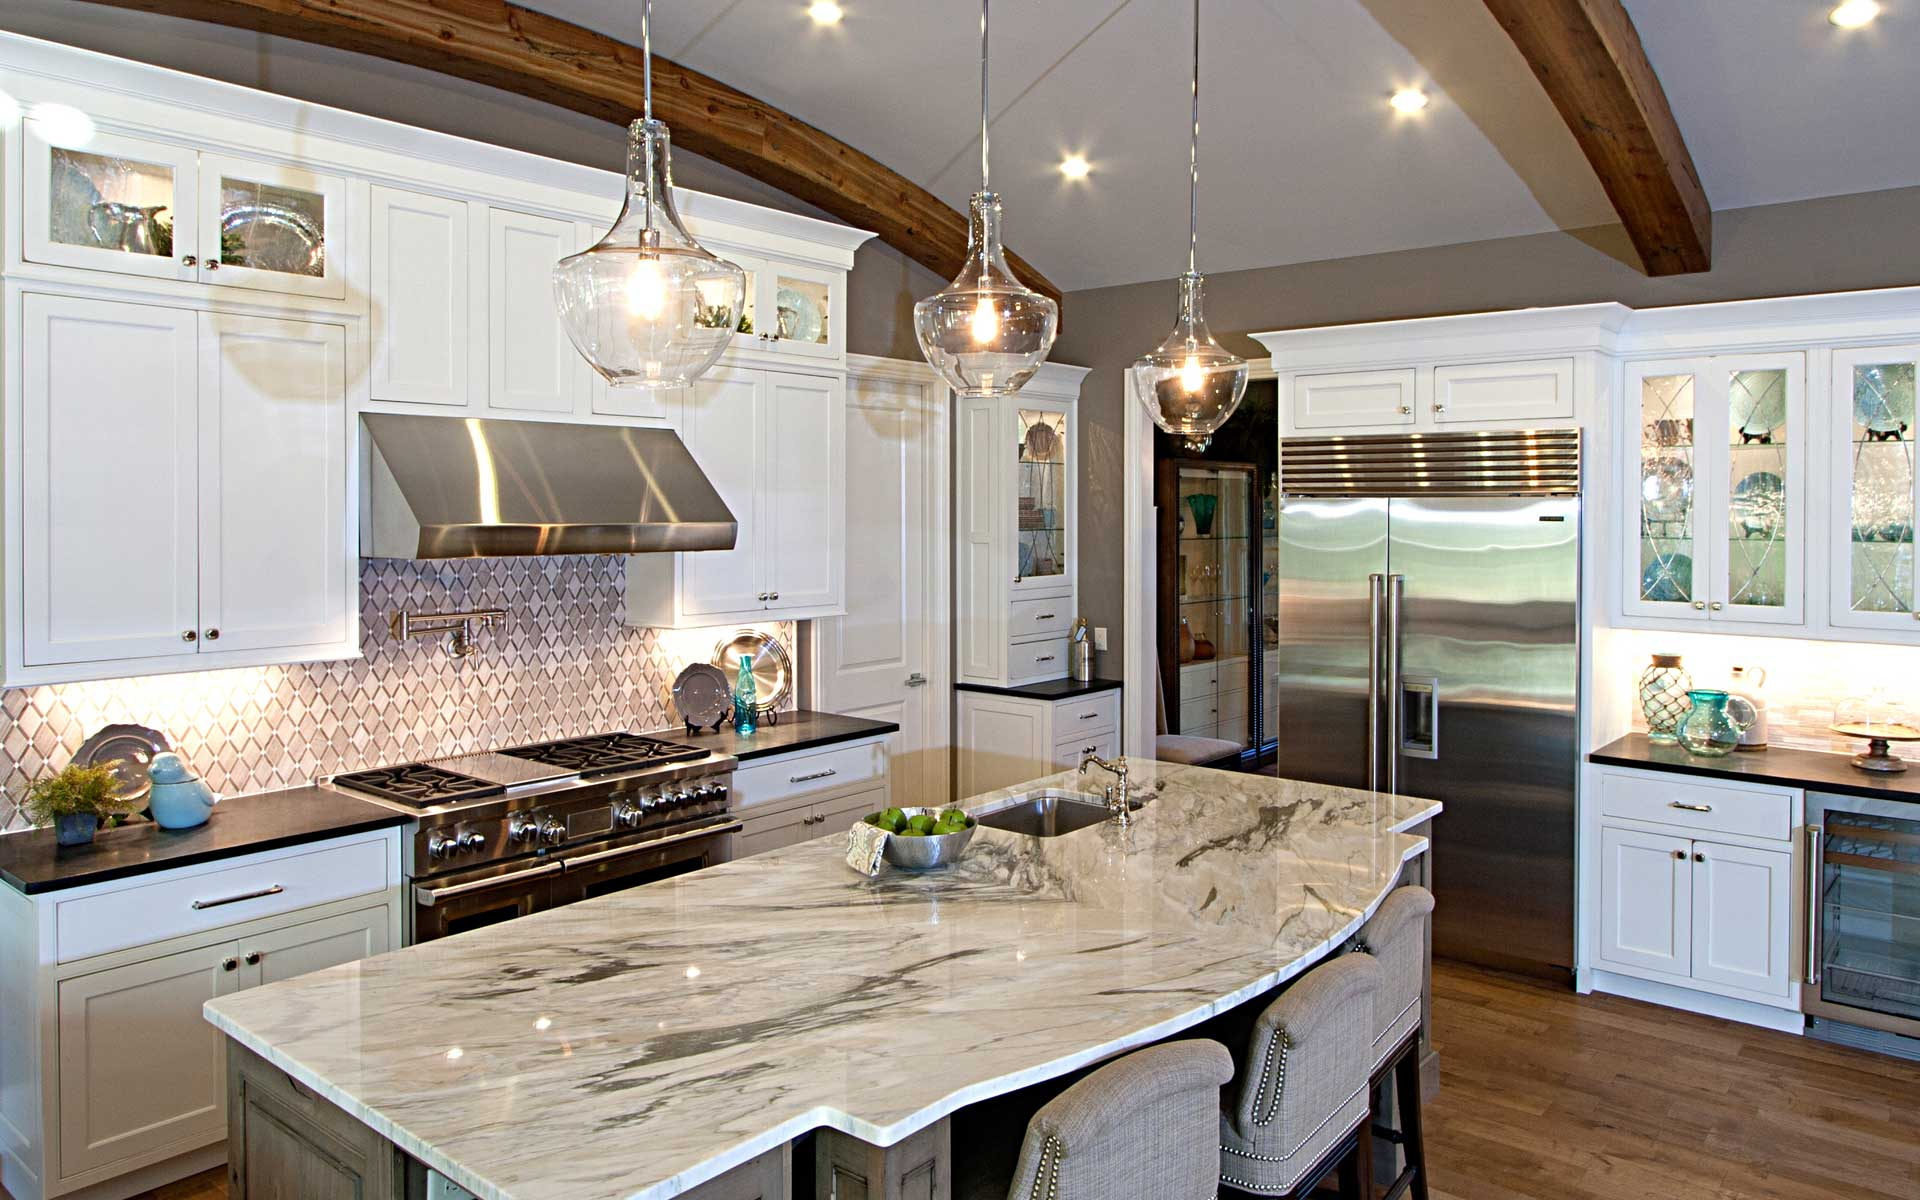 cincykitchens kitchen cabinets cincinnati Serving the Greater Cincinnati area